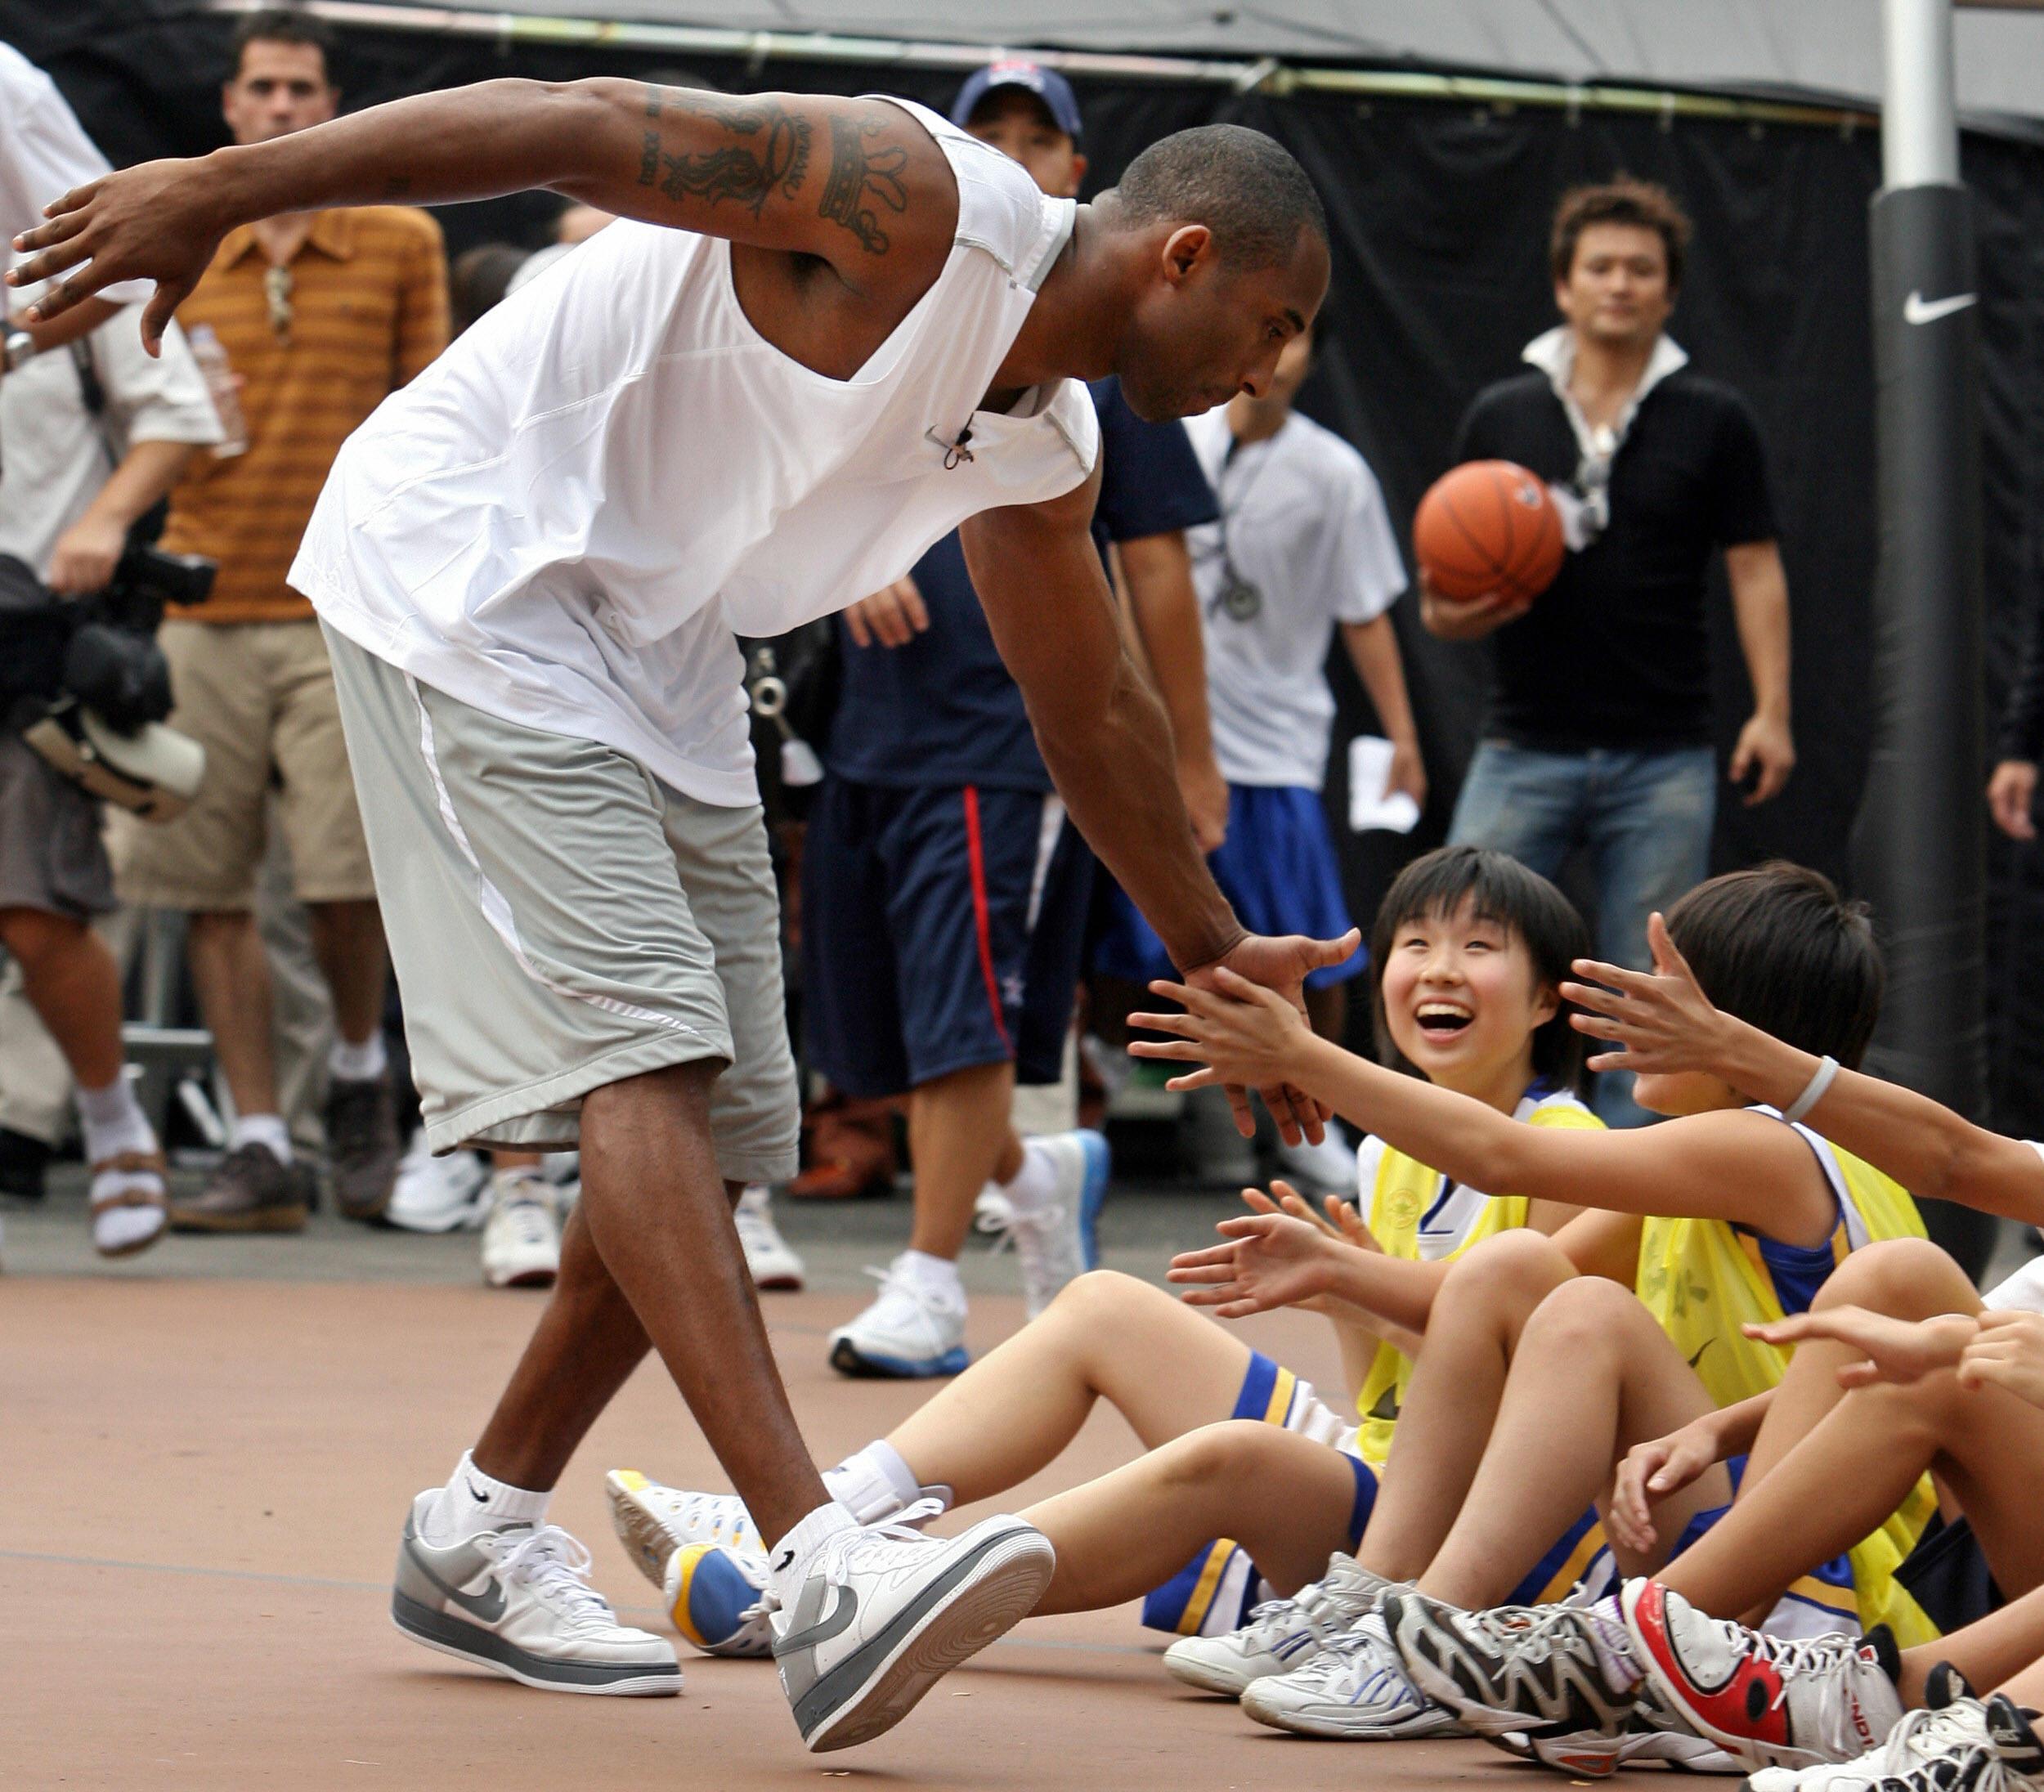 Kobe Bryant greets junior basketball players in Tokyo in September 2006.